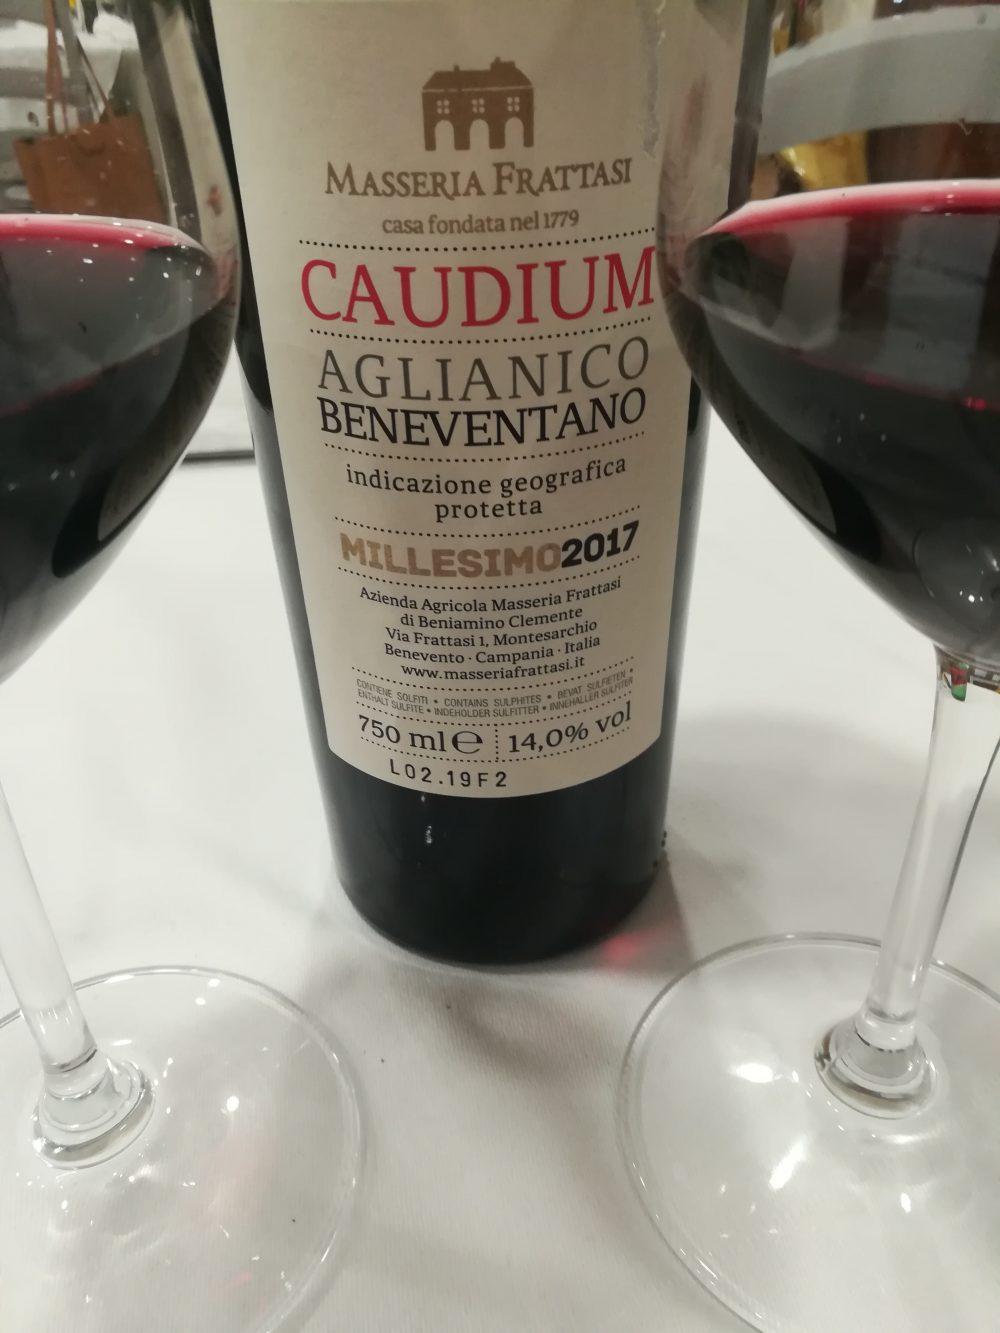 Elia U' Mazzamauriello - il vino